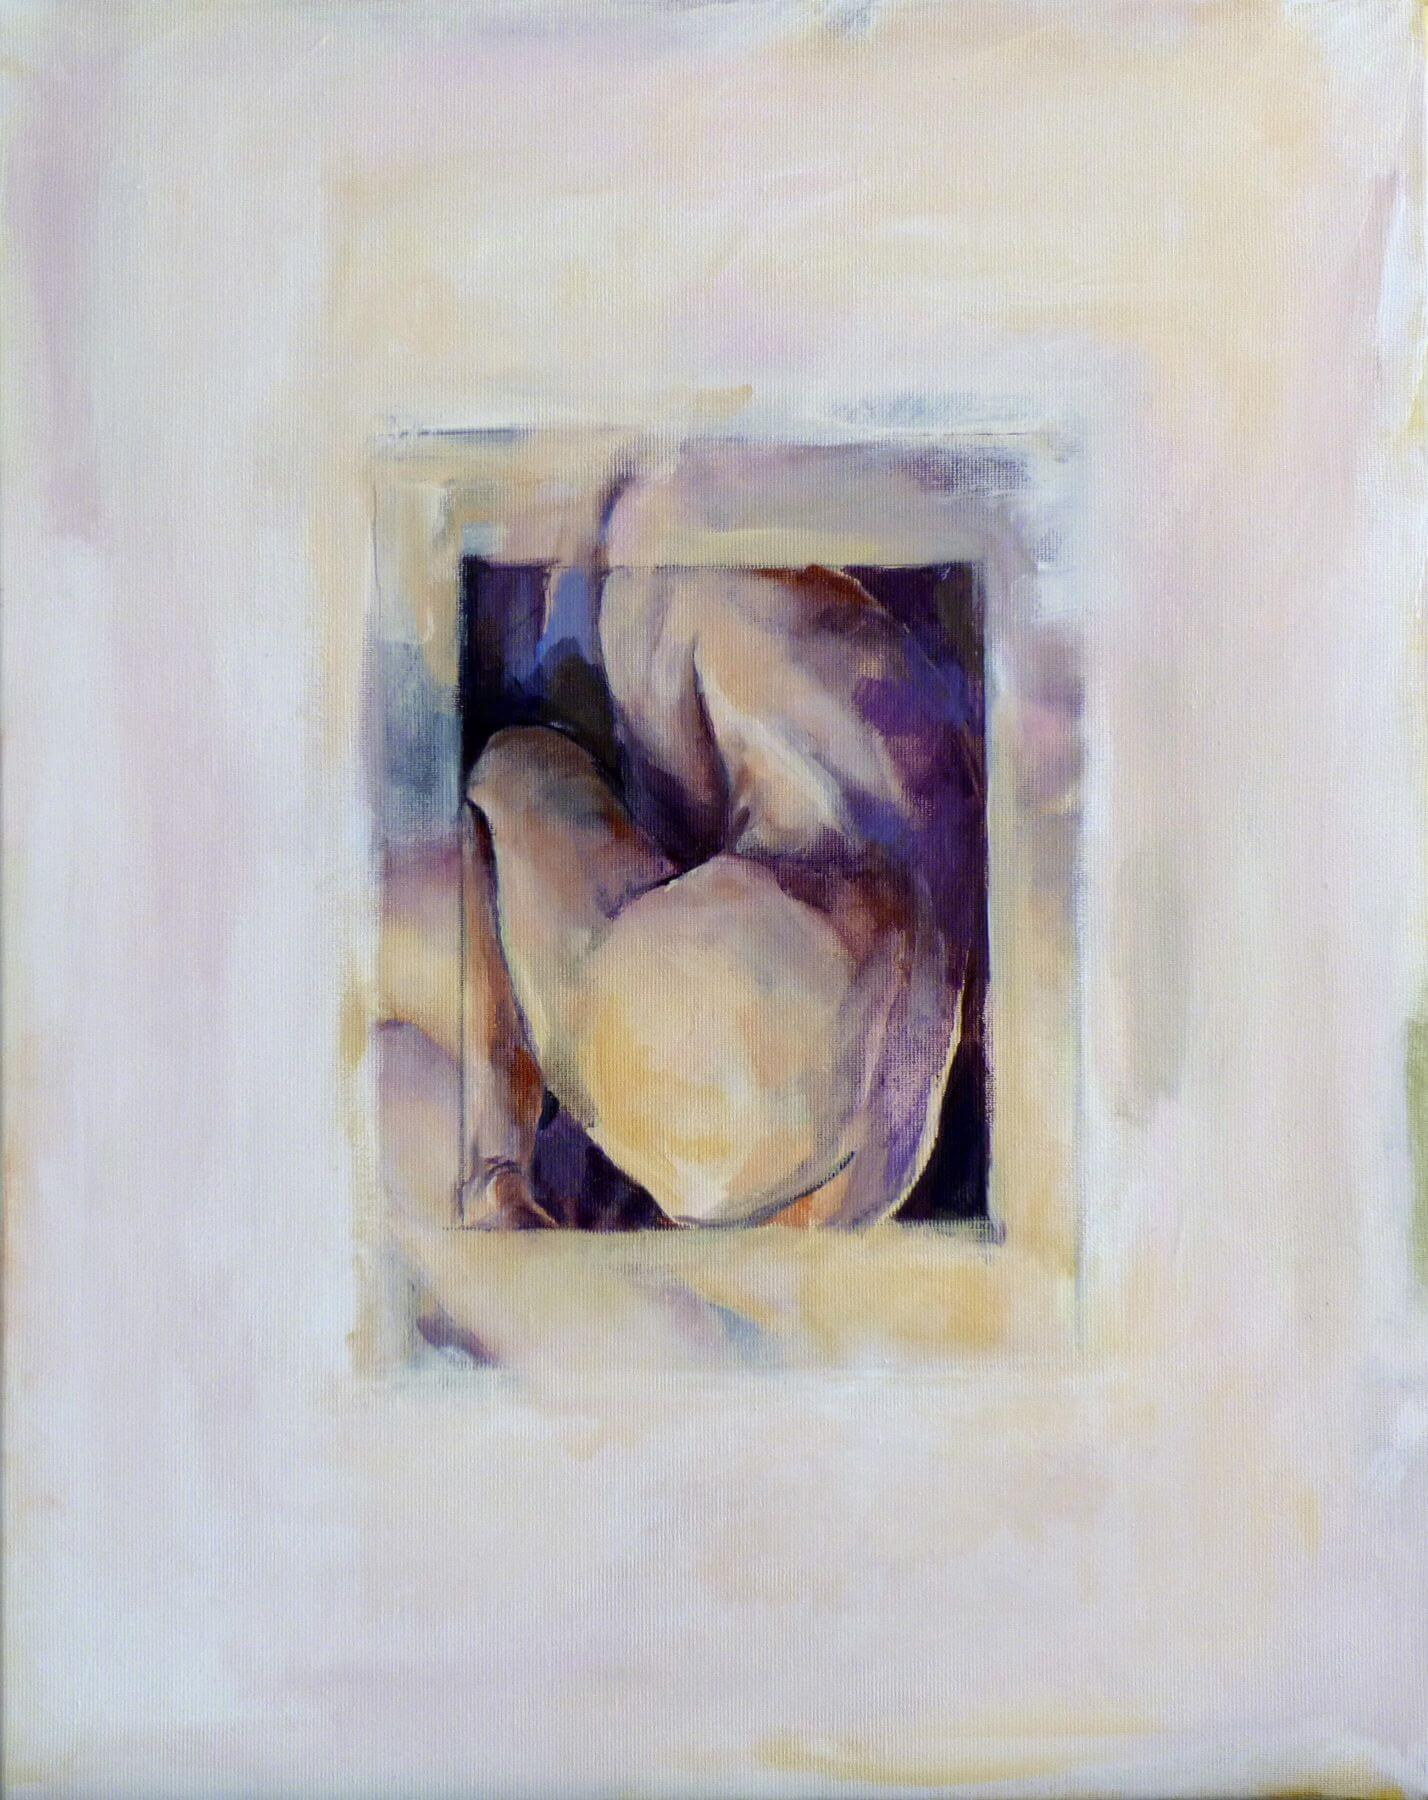 Heart 3 - painting, acrylic on canvas by artist Neva Bergemann